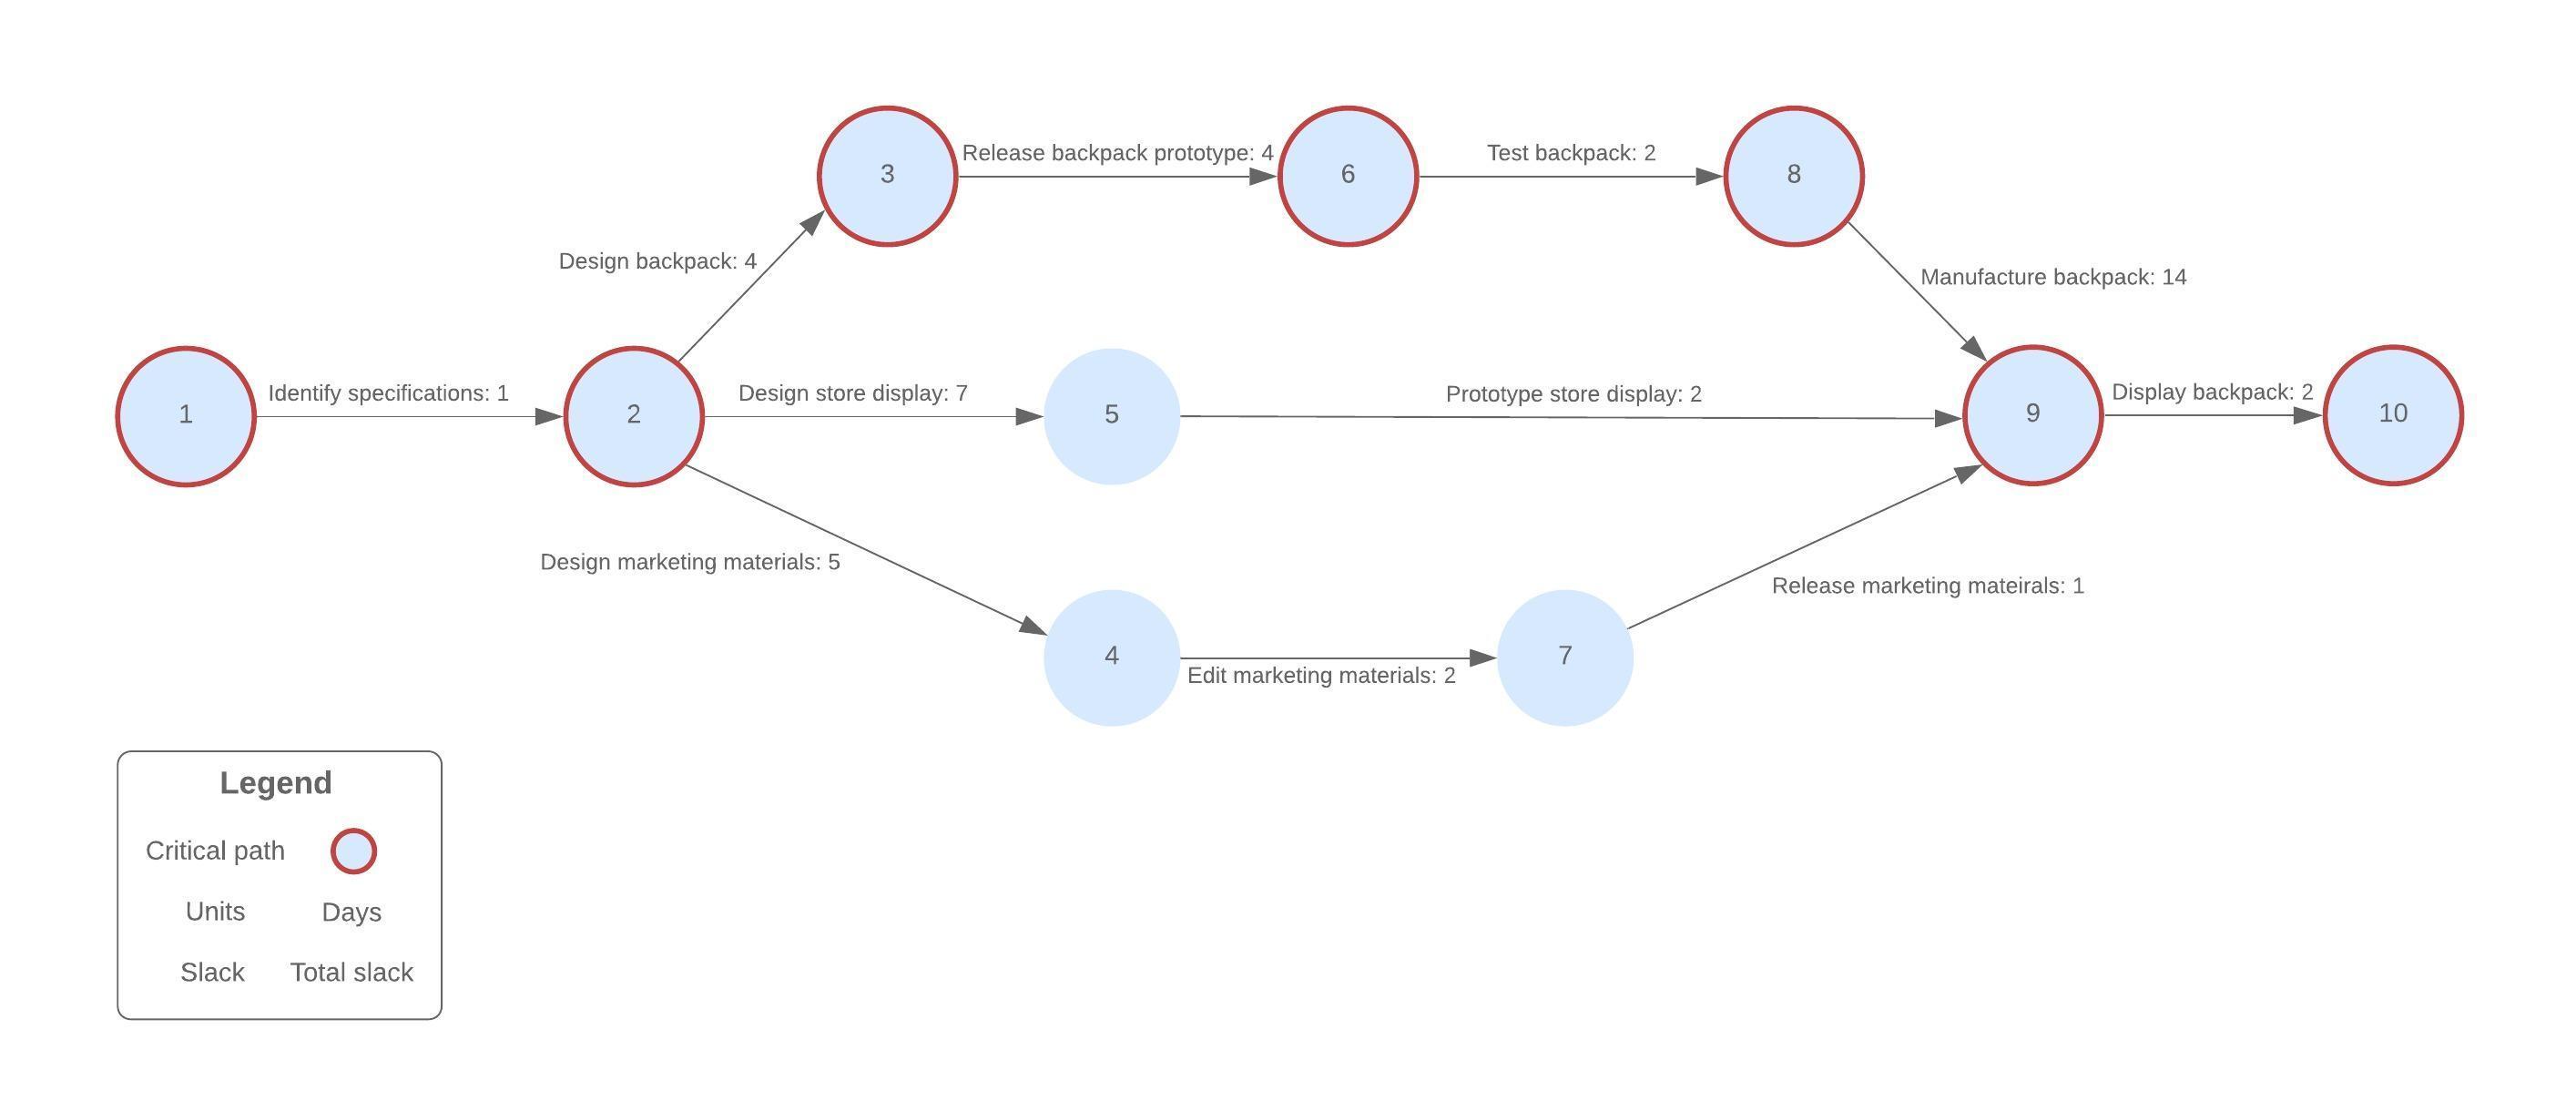 шаблон PERT-схемы